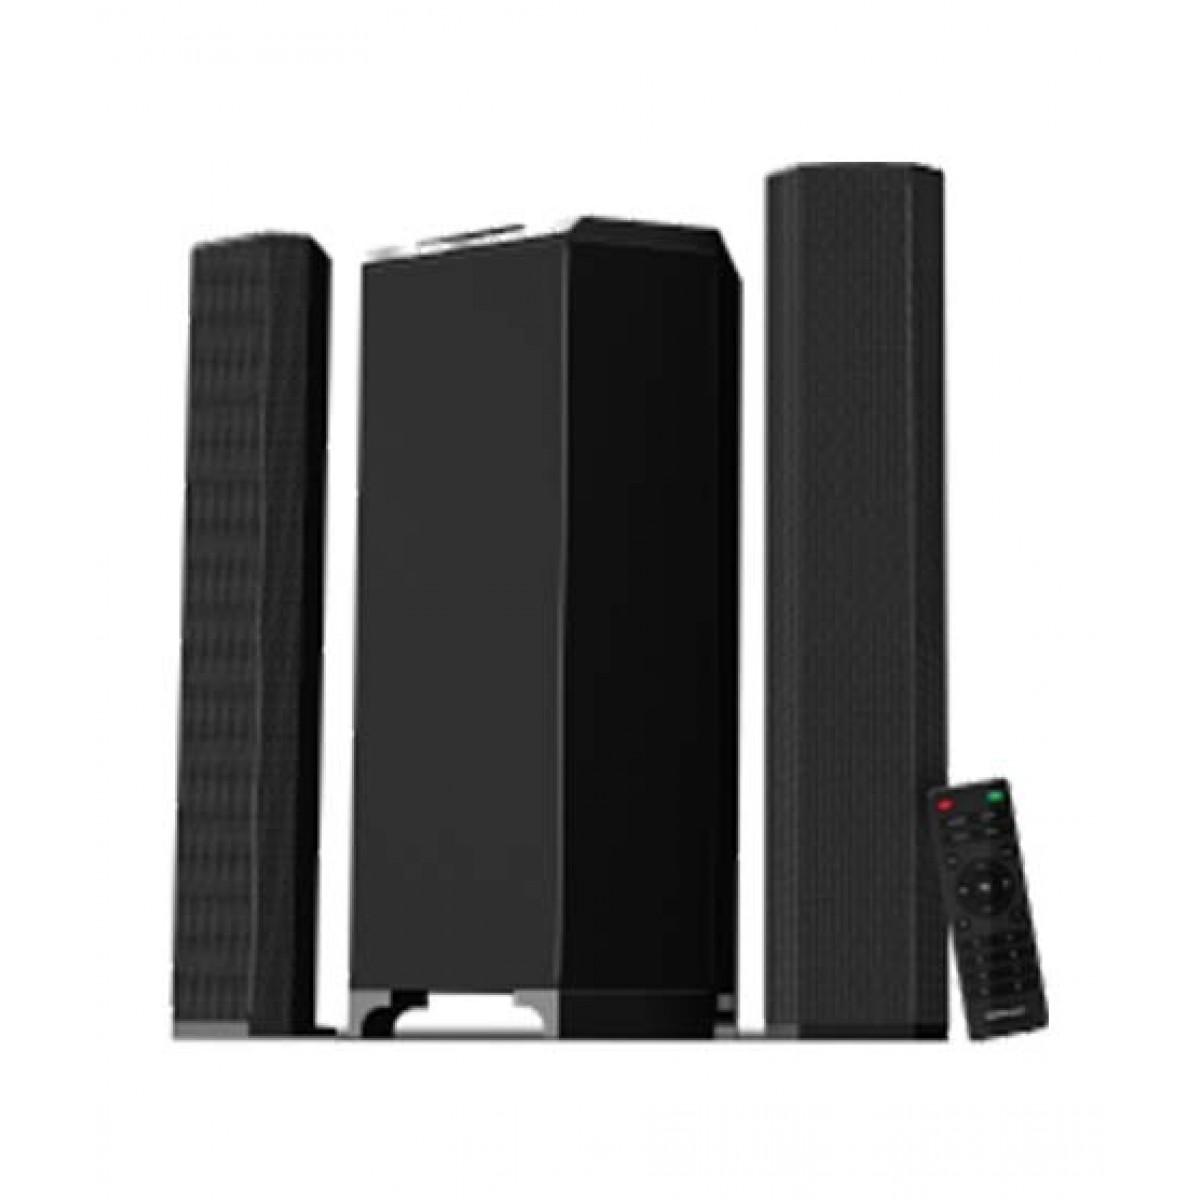 Changhong Ruba HT Series 2.1 Channel Speaker System (AS-CHR626G)